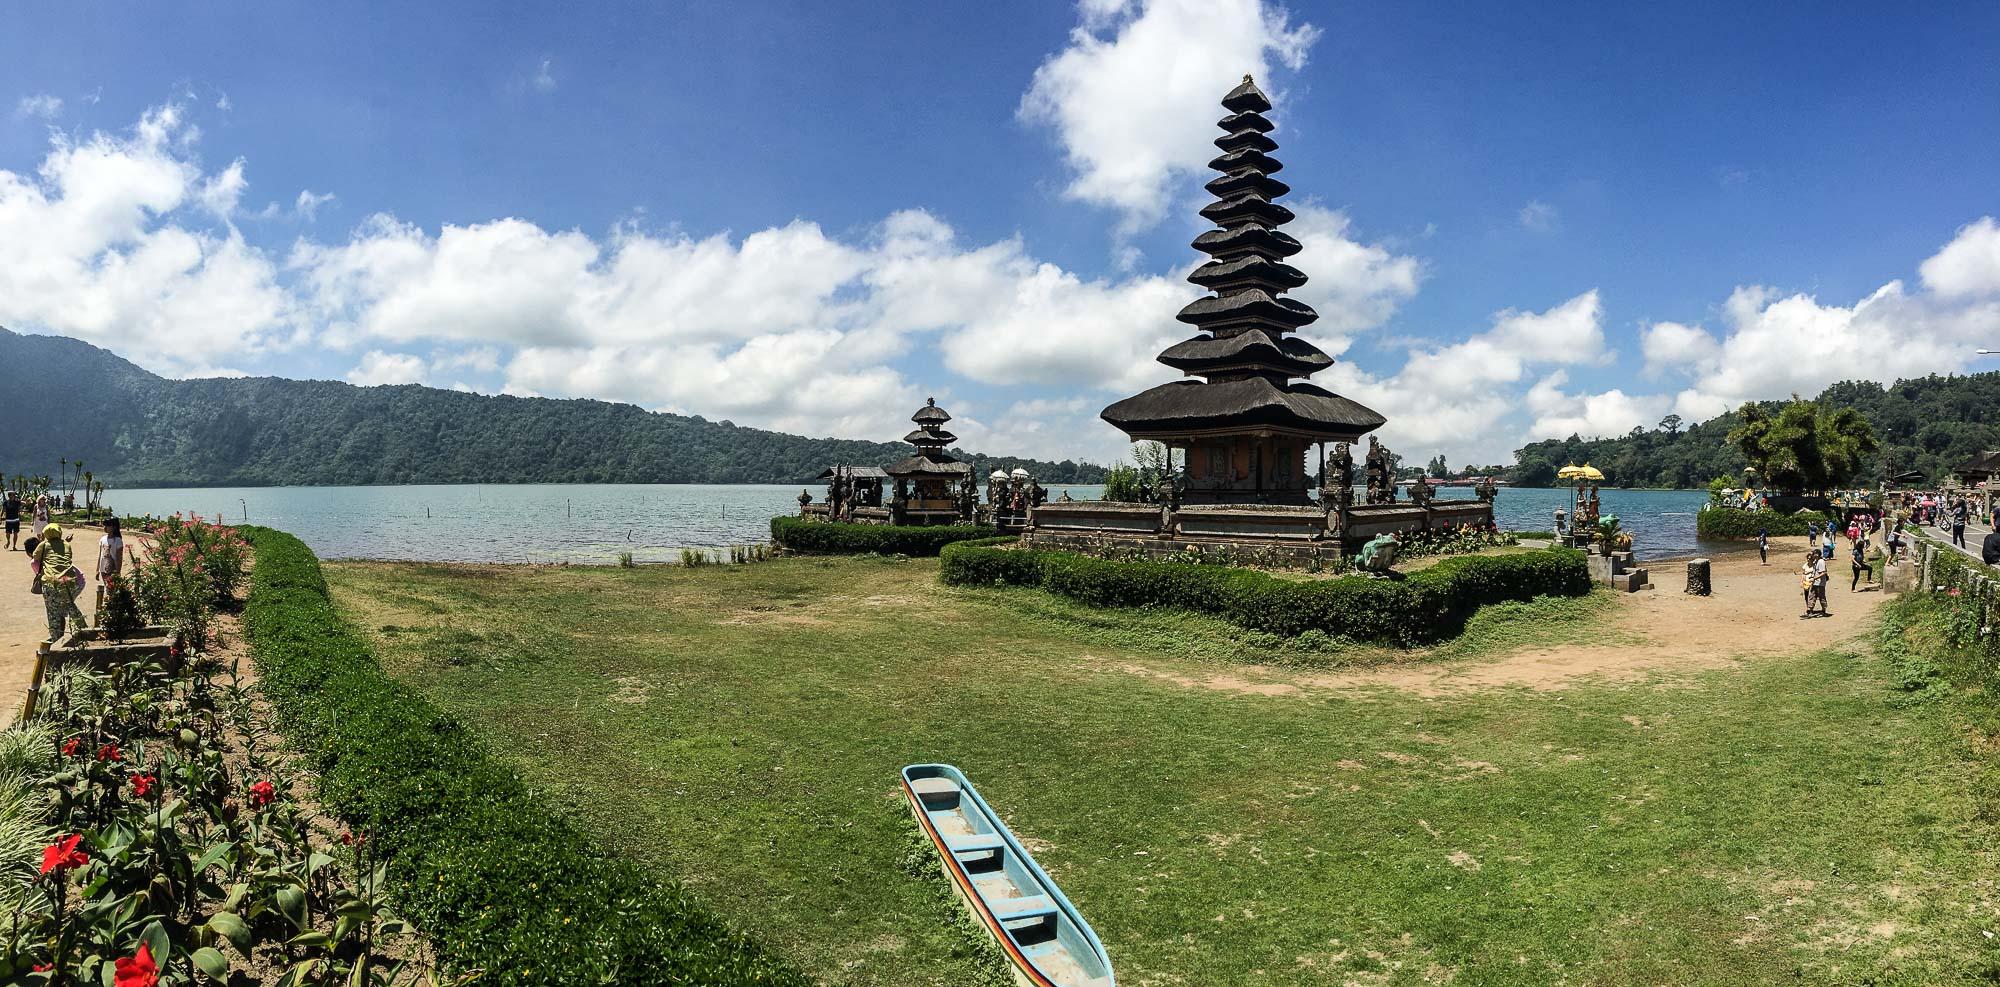 INDONESIA_2015_04 BALI_JusMedic_1156